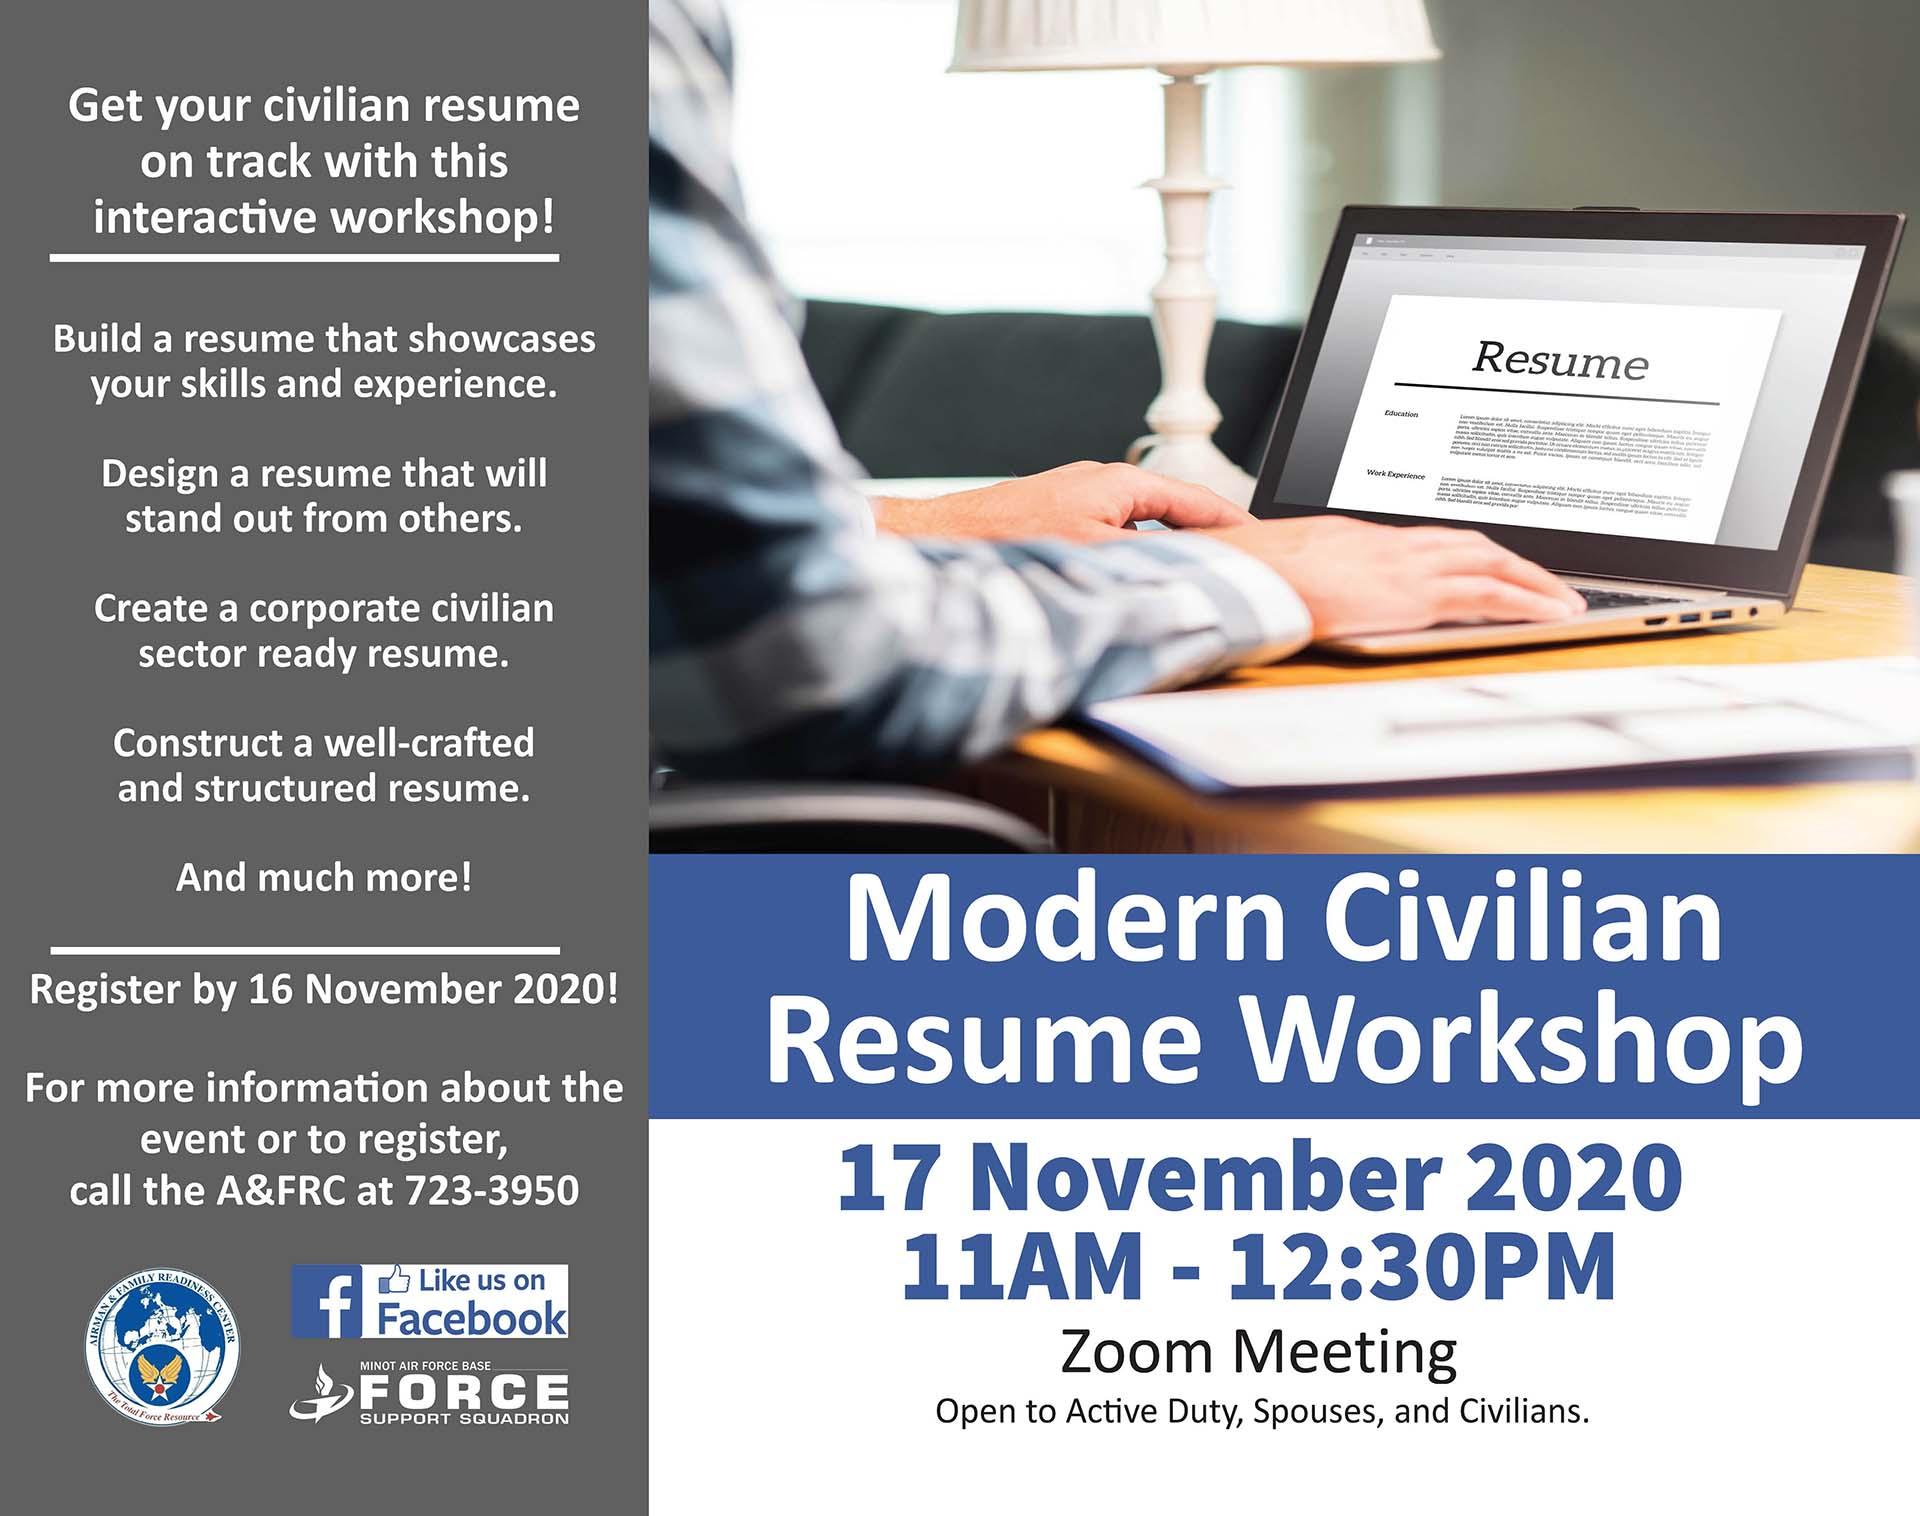 Modern Civilian Resume Workshop - ONLINE